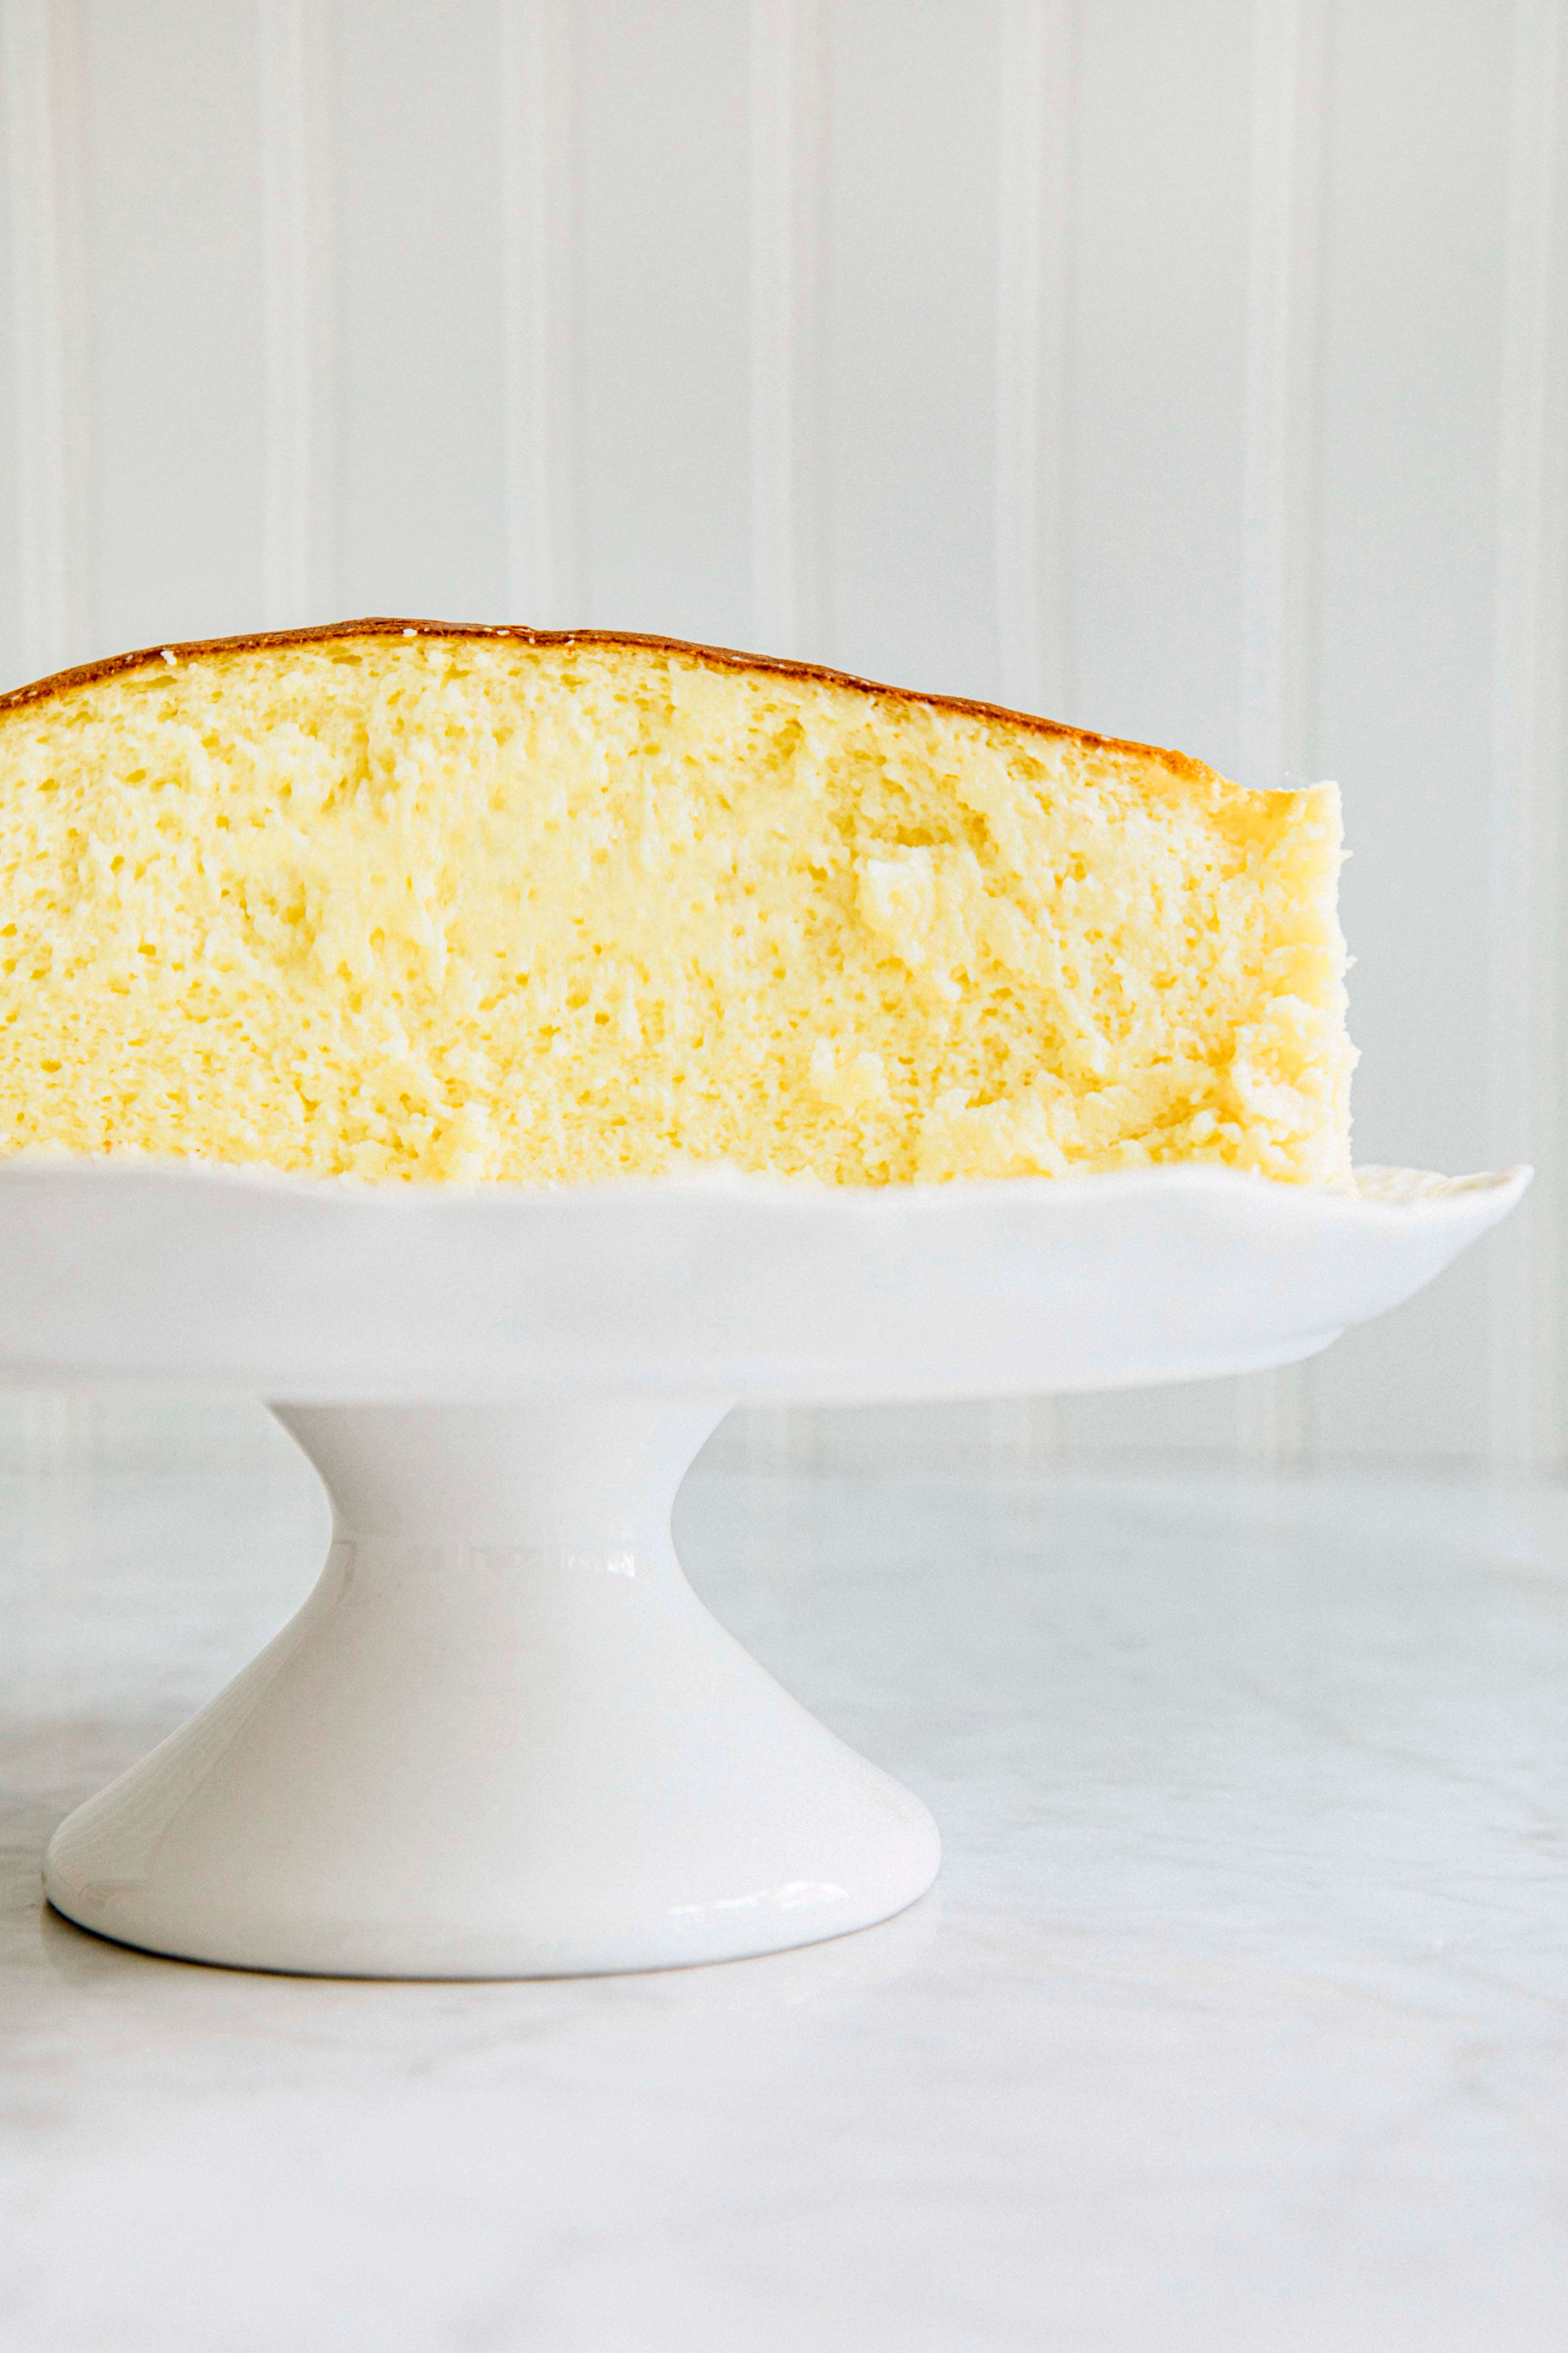 Yuzu Soufflé Cheesecake